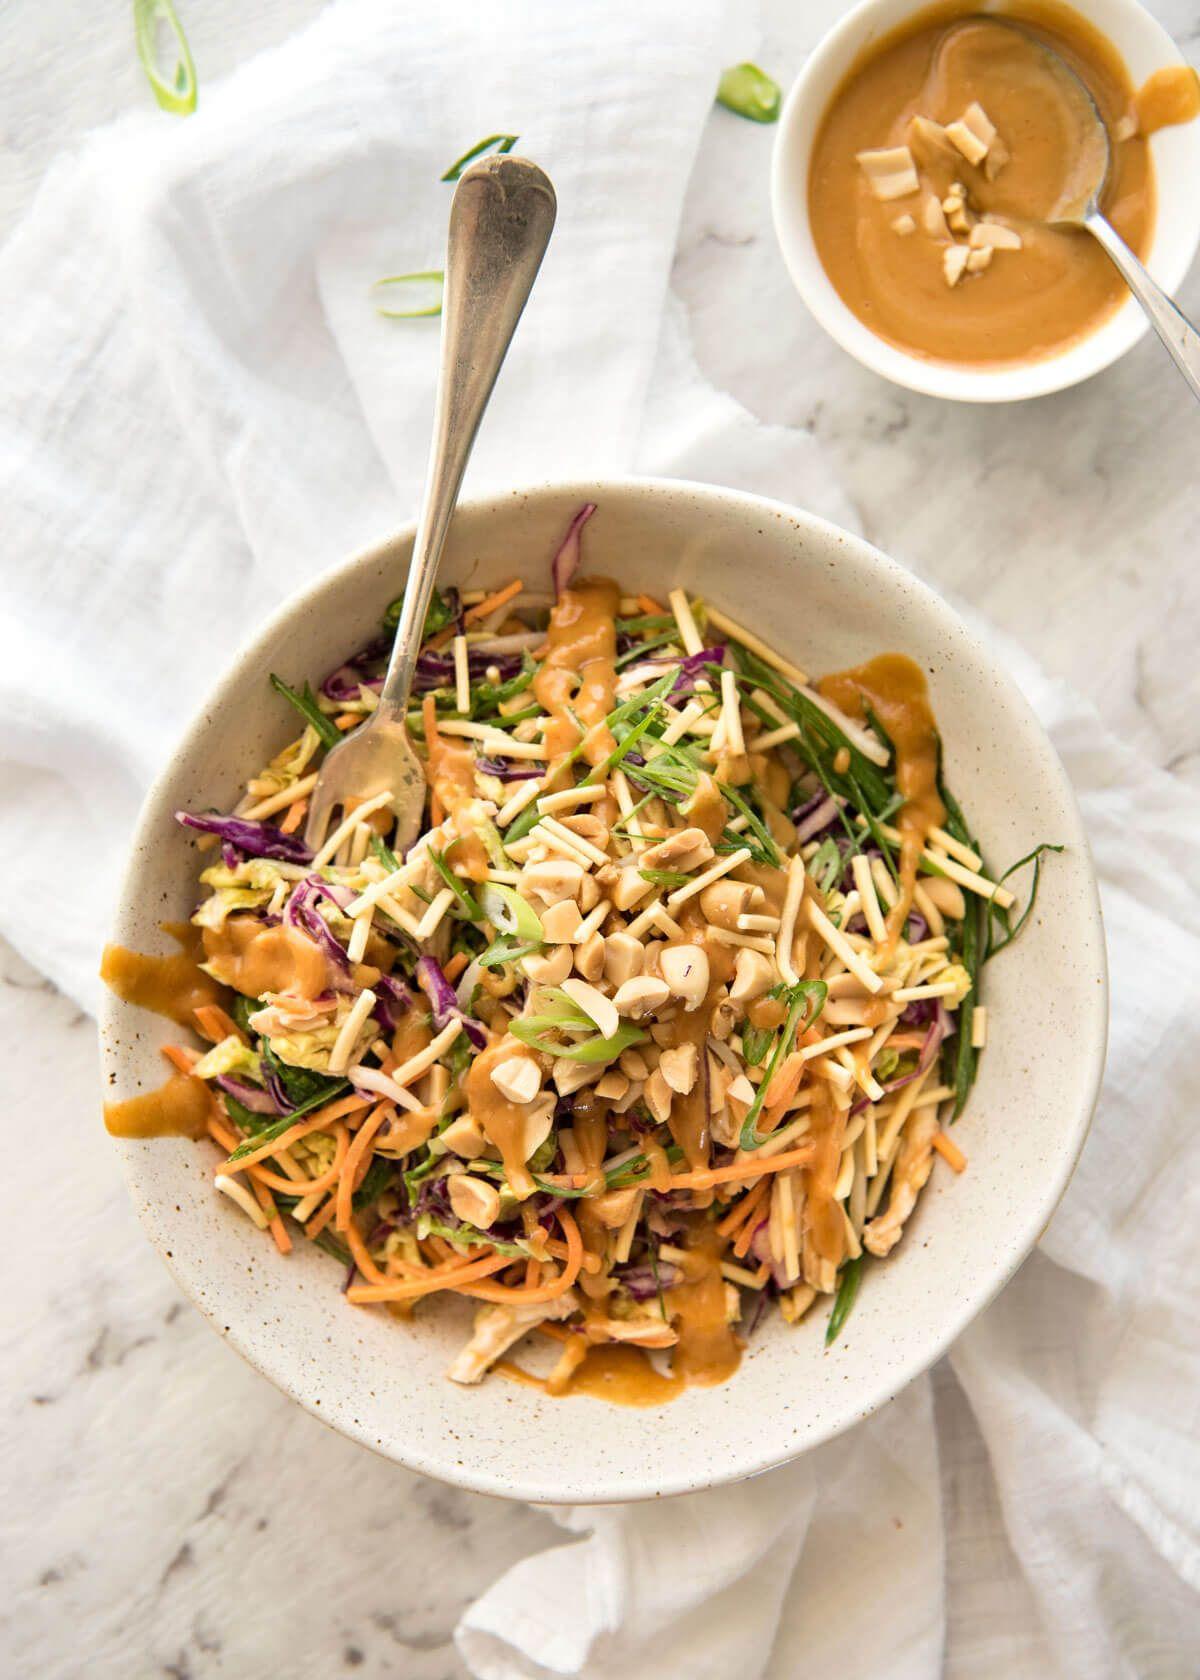 Salatdressing chinesisch